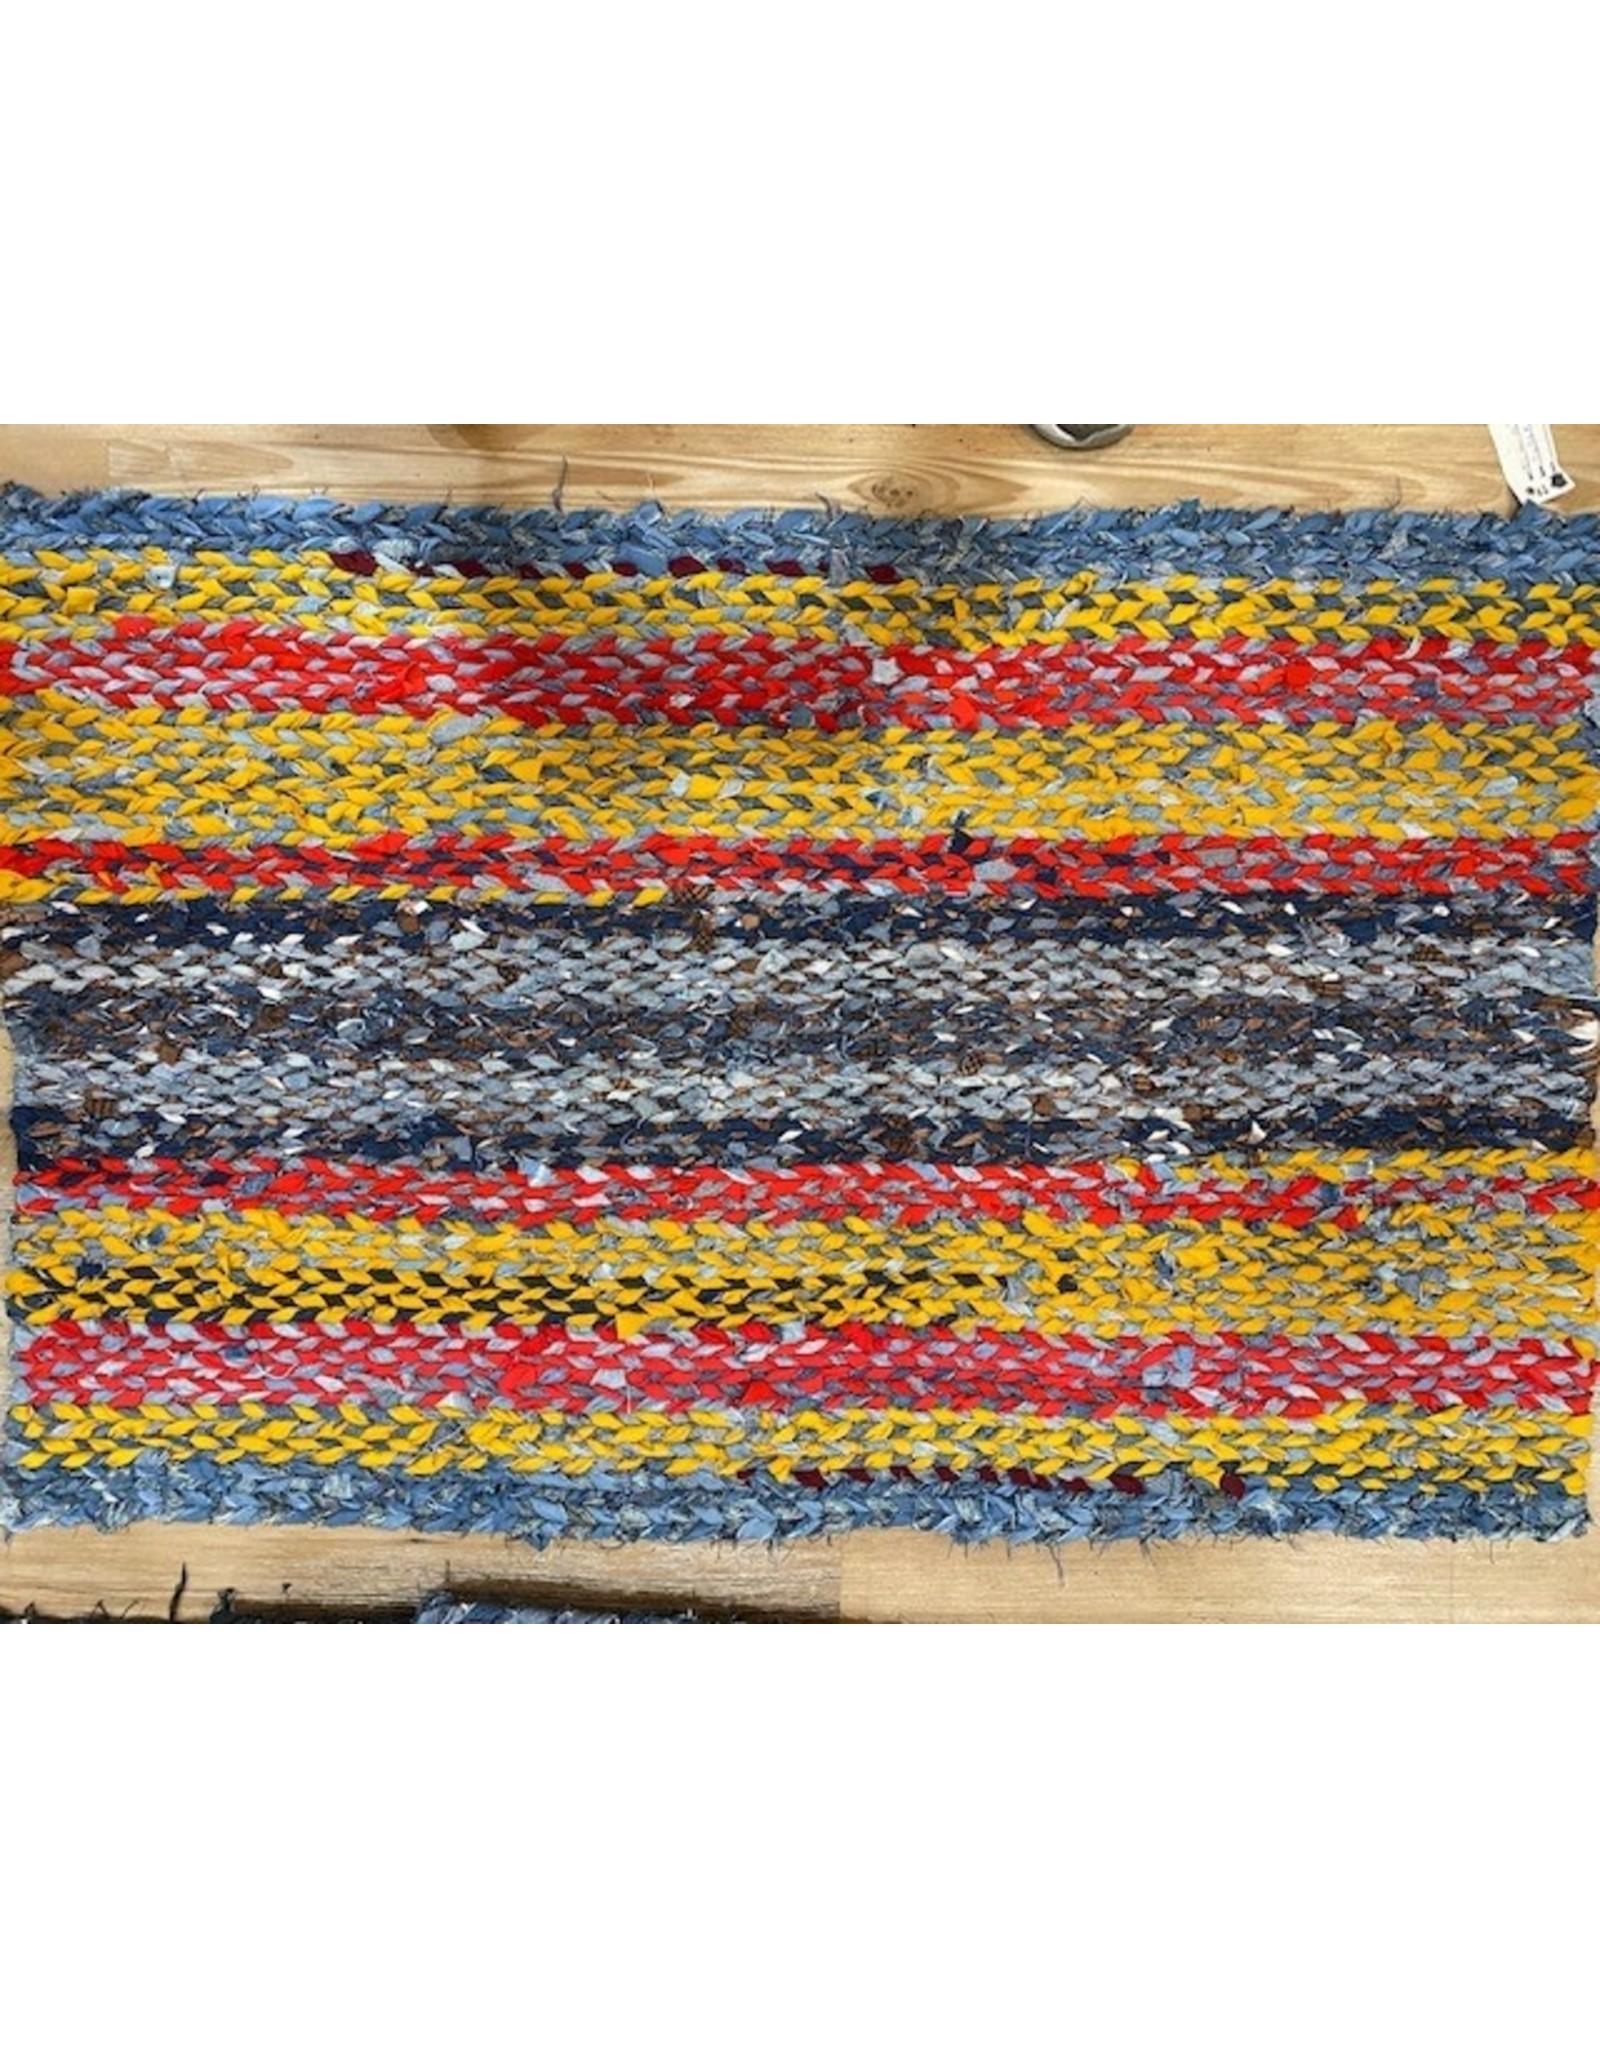 "Artist Jean Long JLRUG65 Jean Long One of Kind Woven Rug 27.5""x42"""